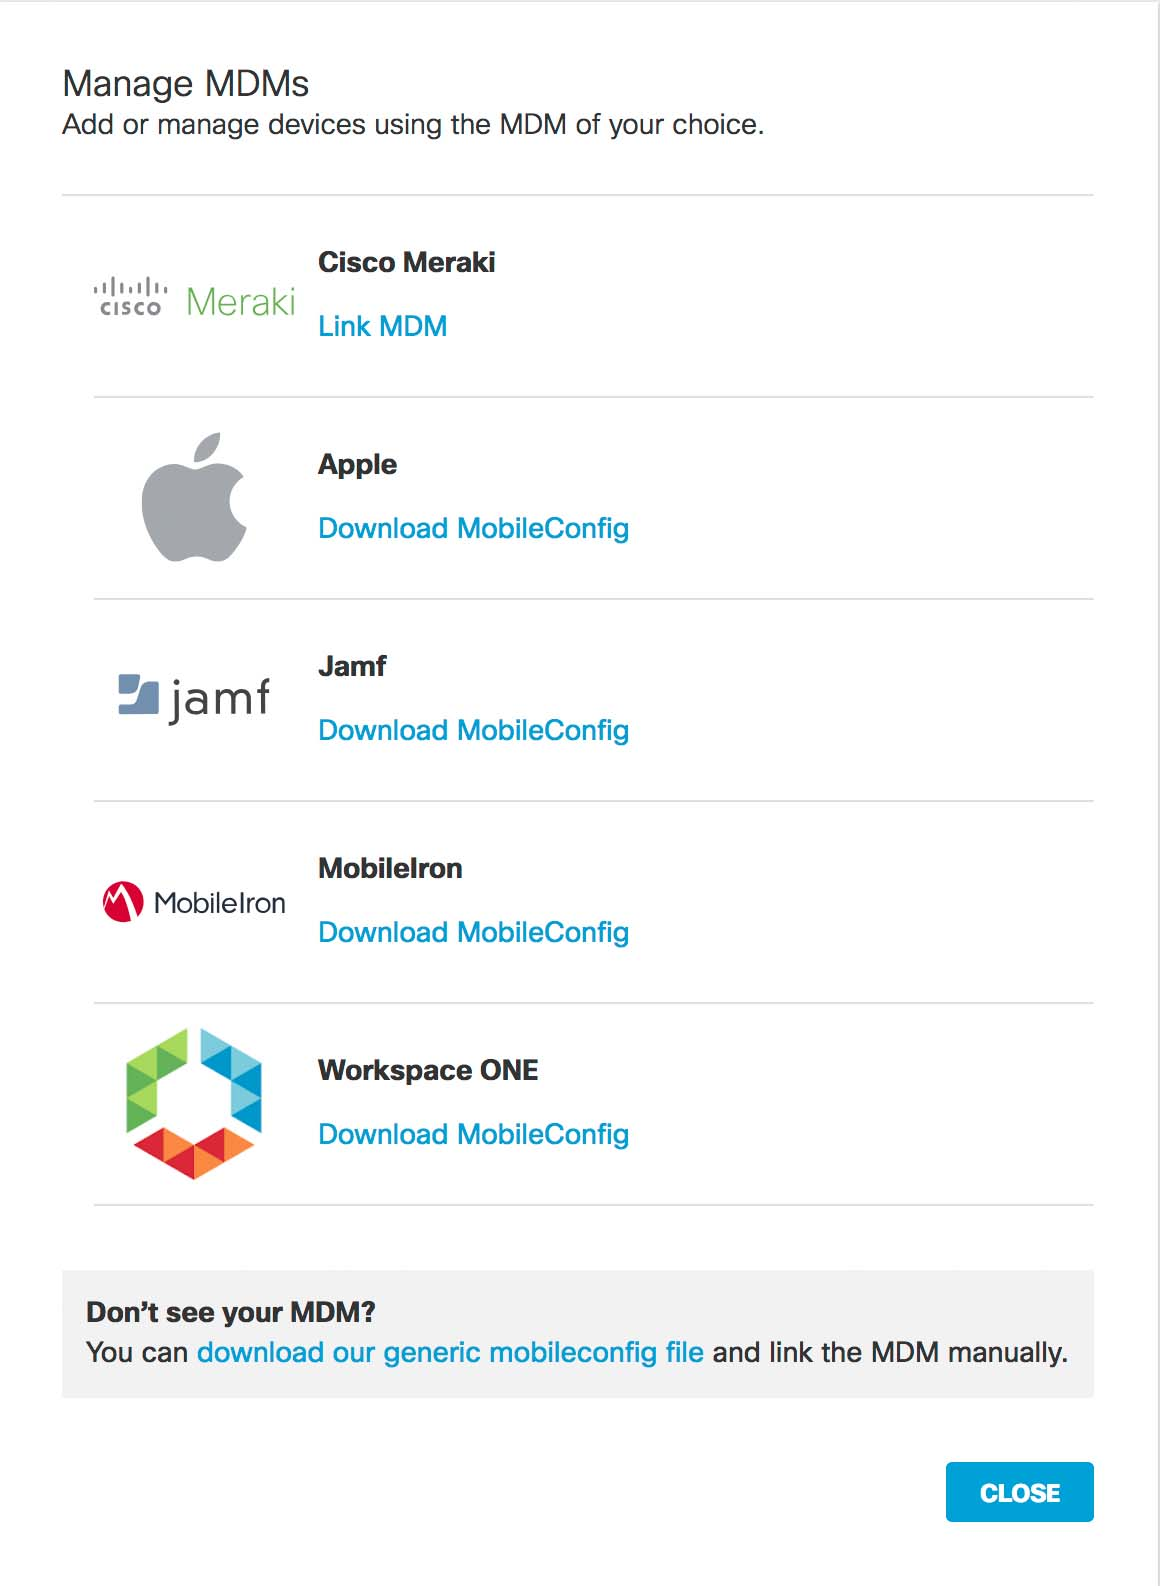 Register an iOS Device Through a Generic MDM System